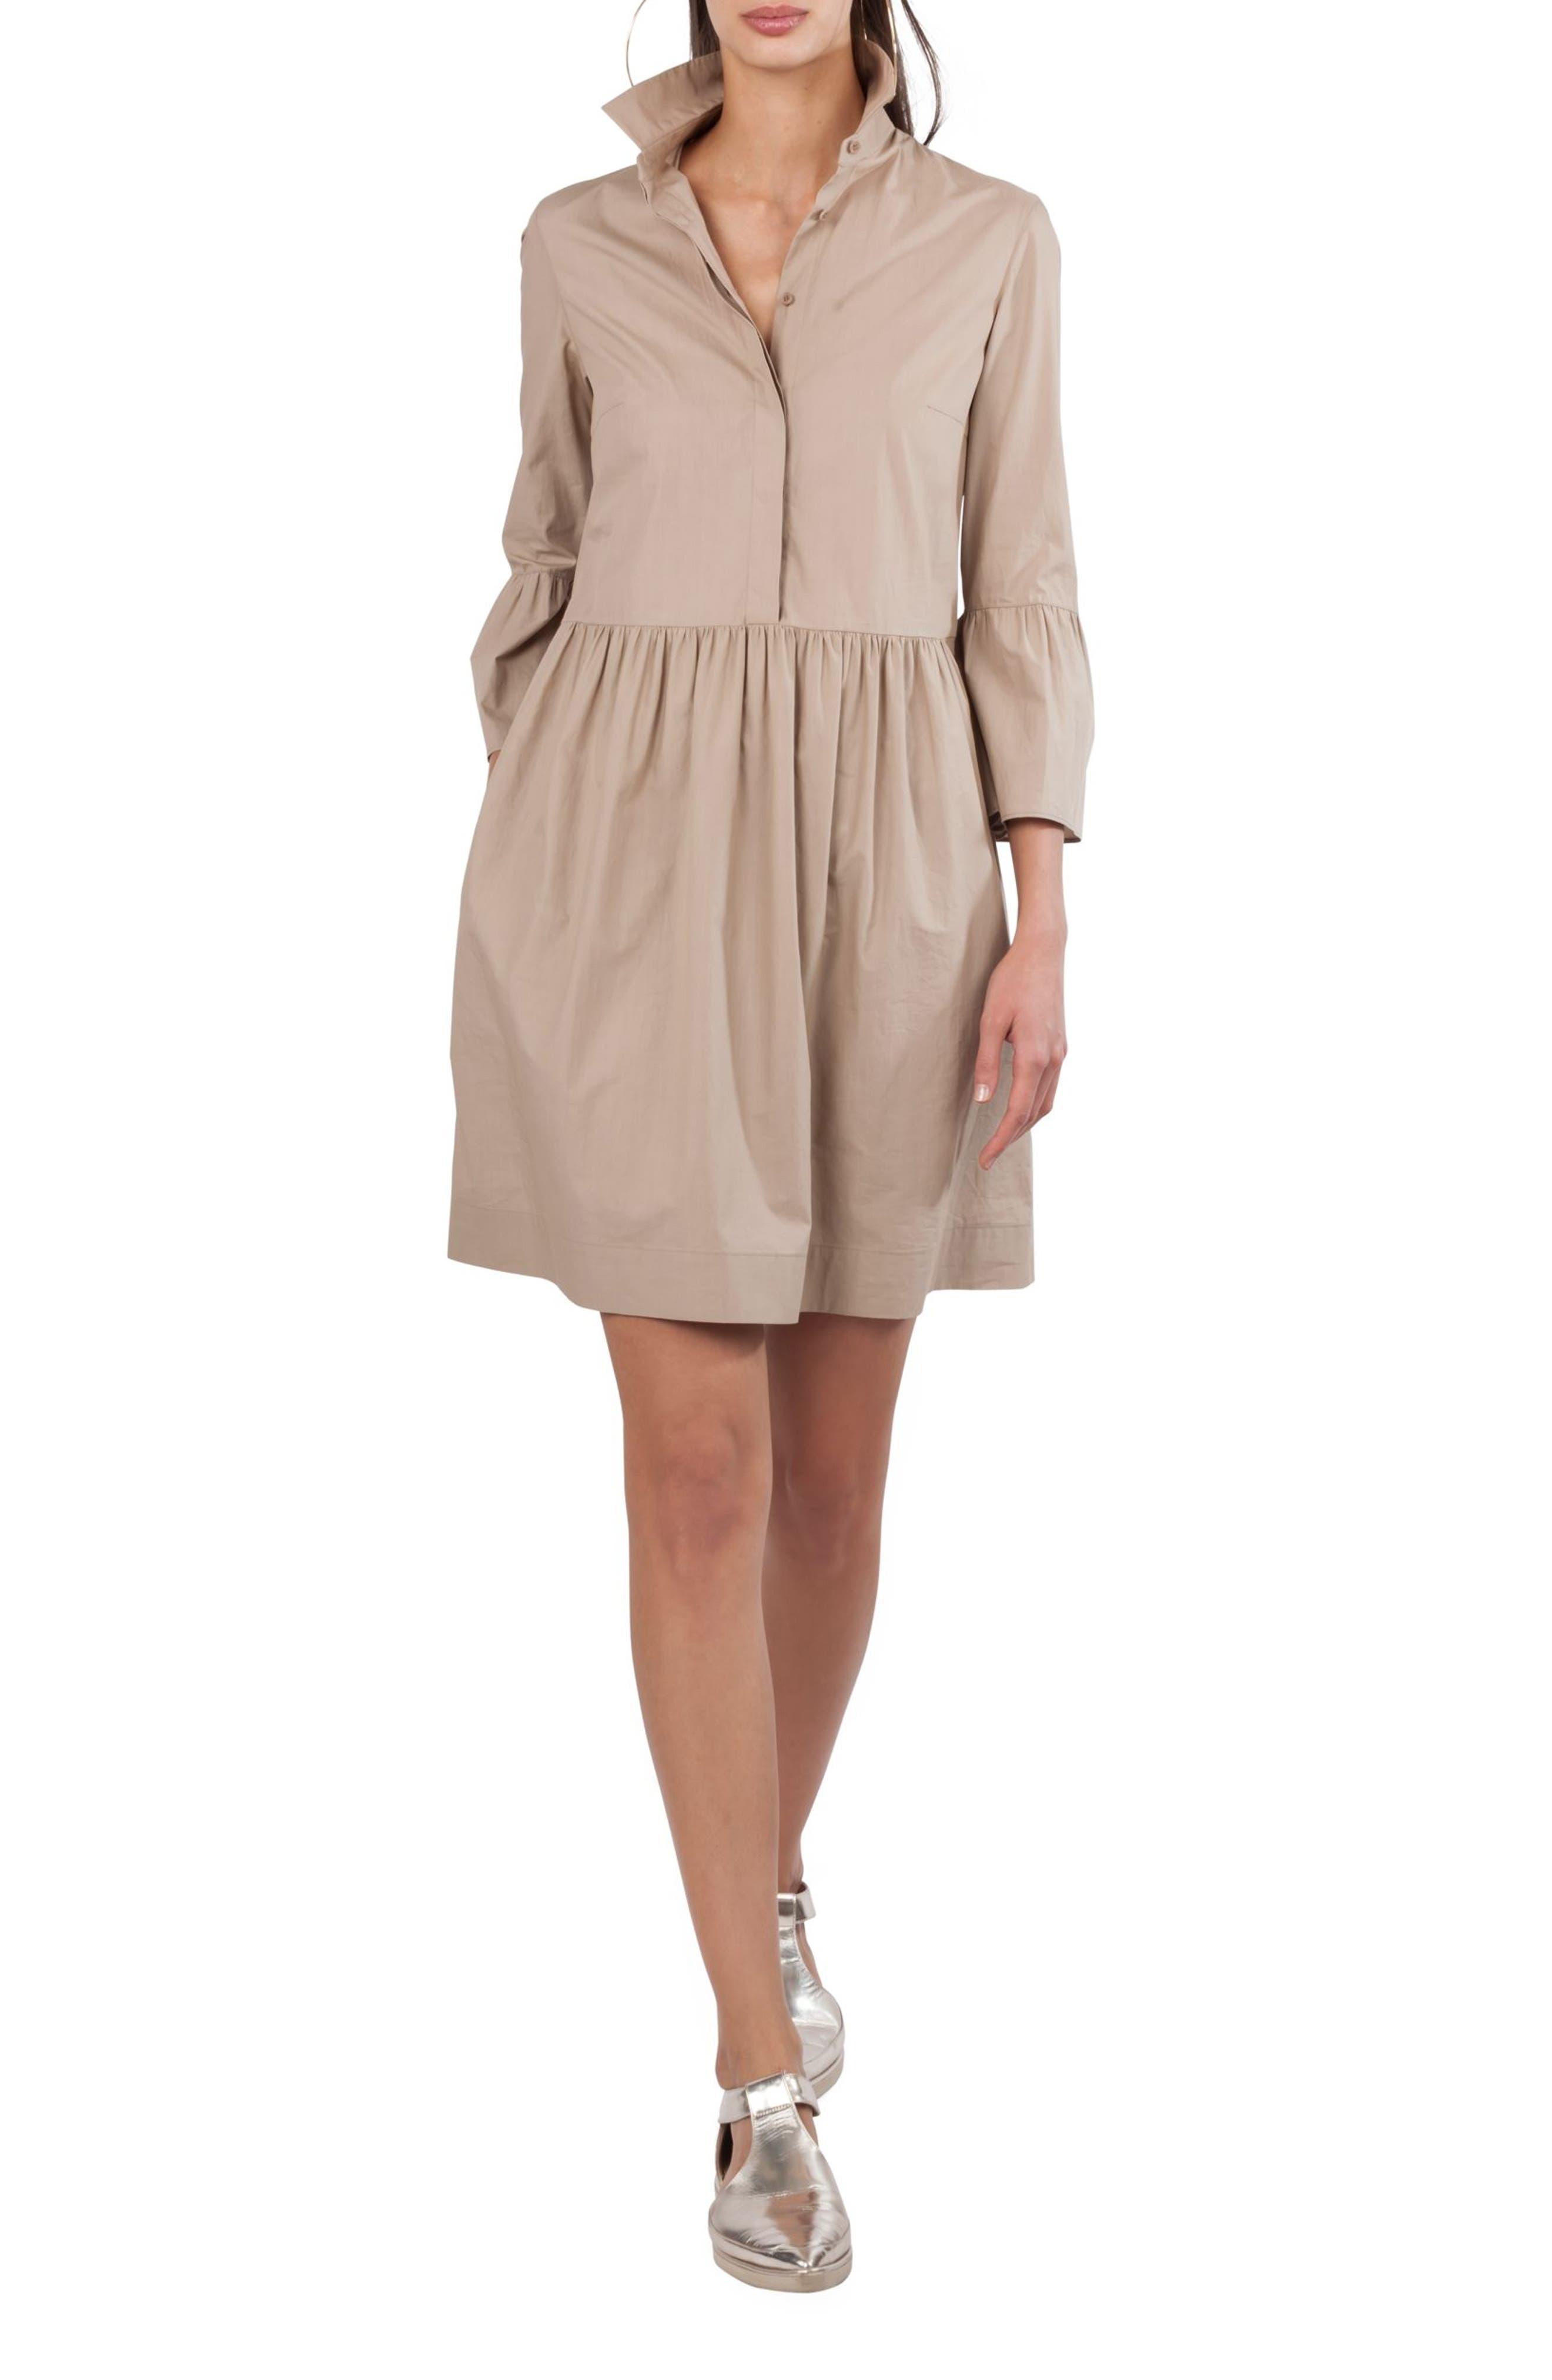 Alternate Image 1 Selected - Akris punto Ruffle Skirt Shirtdress